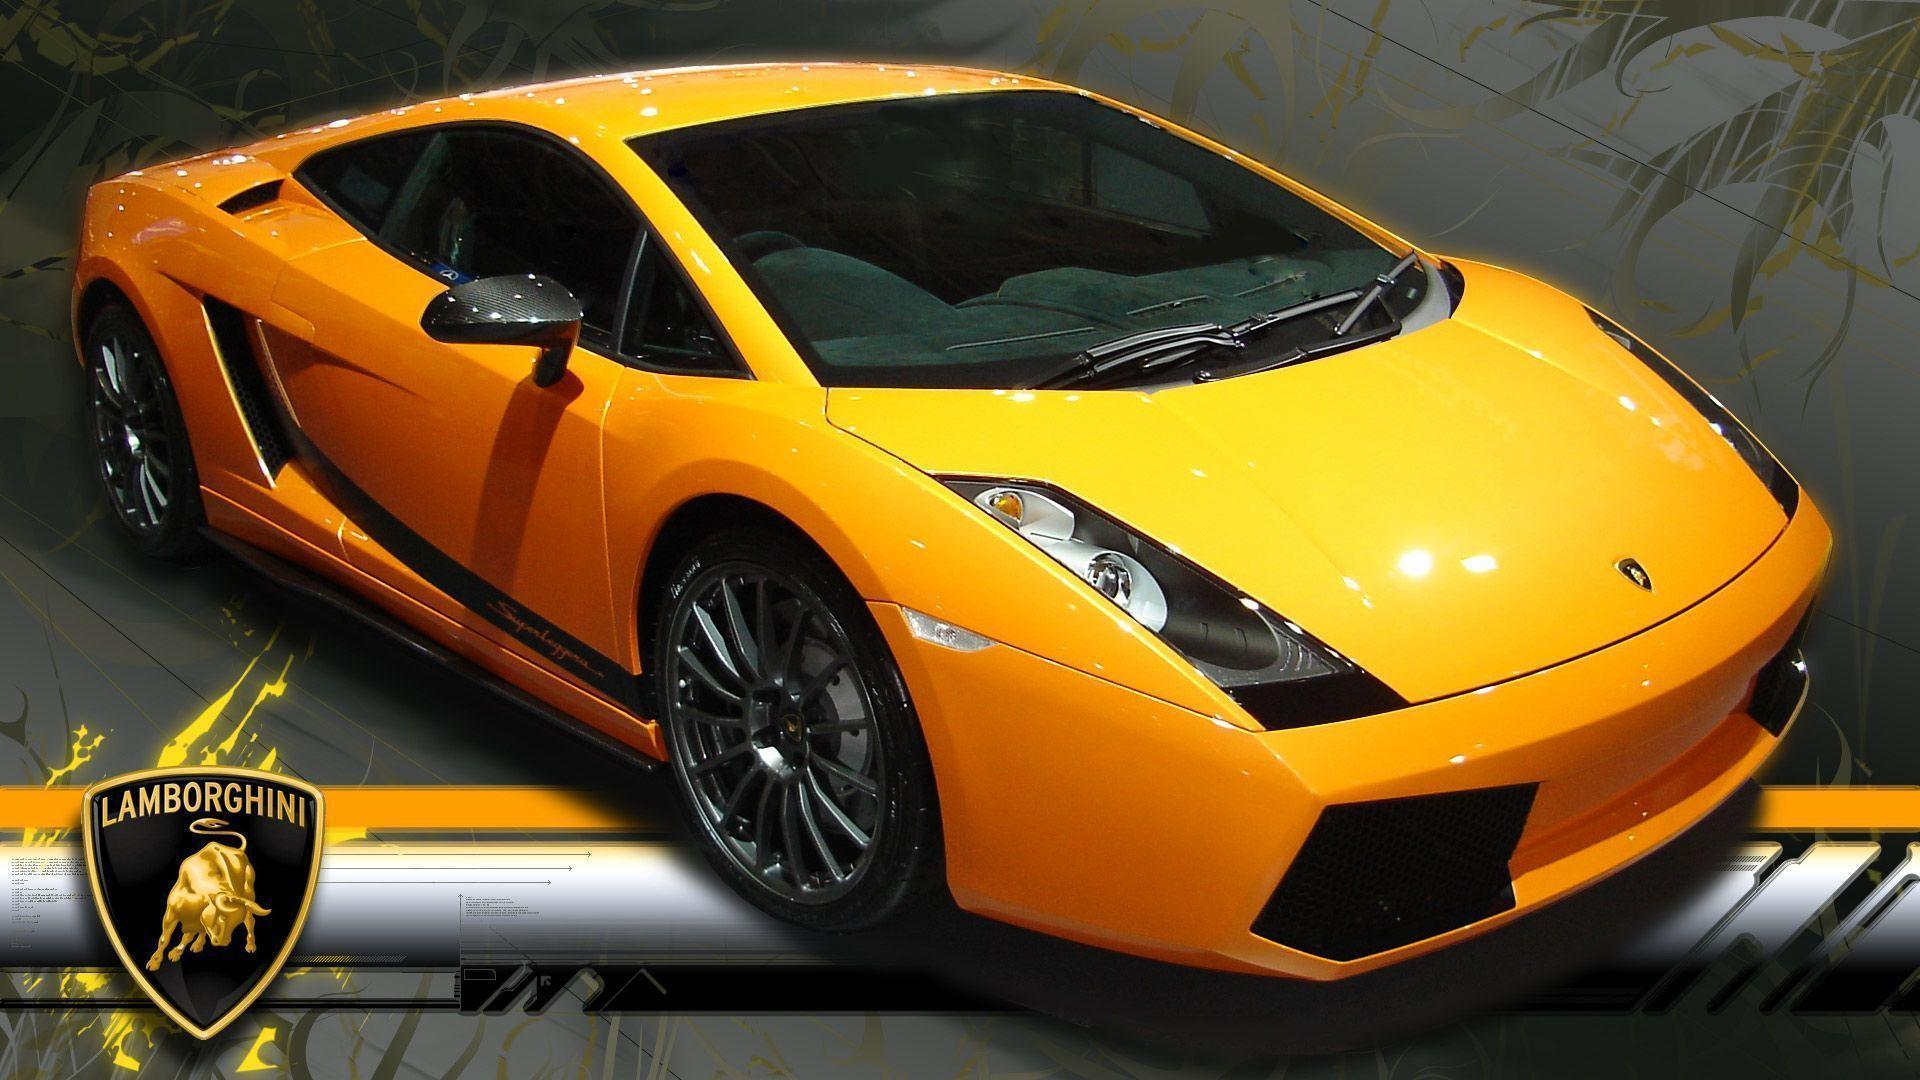 Lamborghini Aventador Lp700-4 Wallpapers · Lamborghini Wallpapers ...